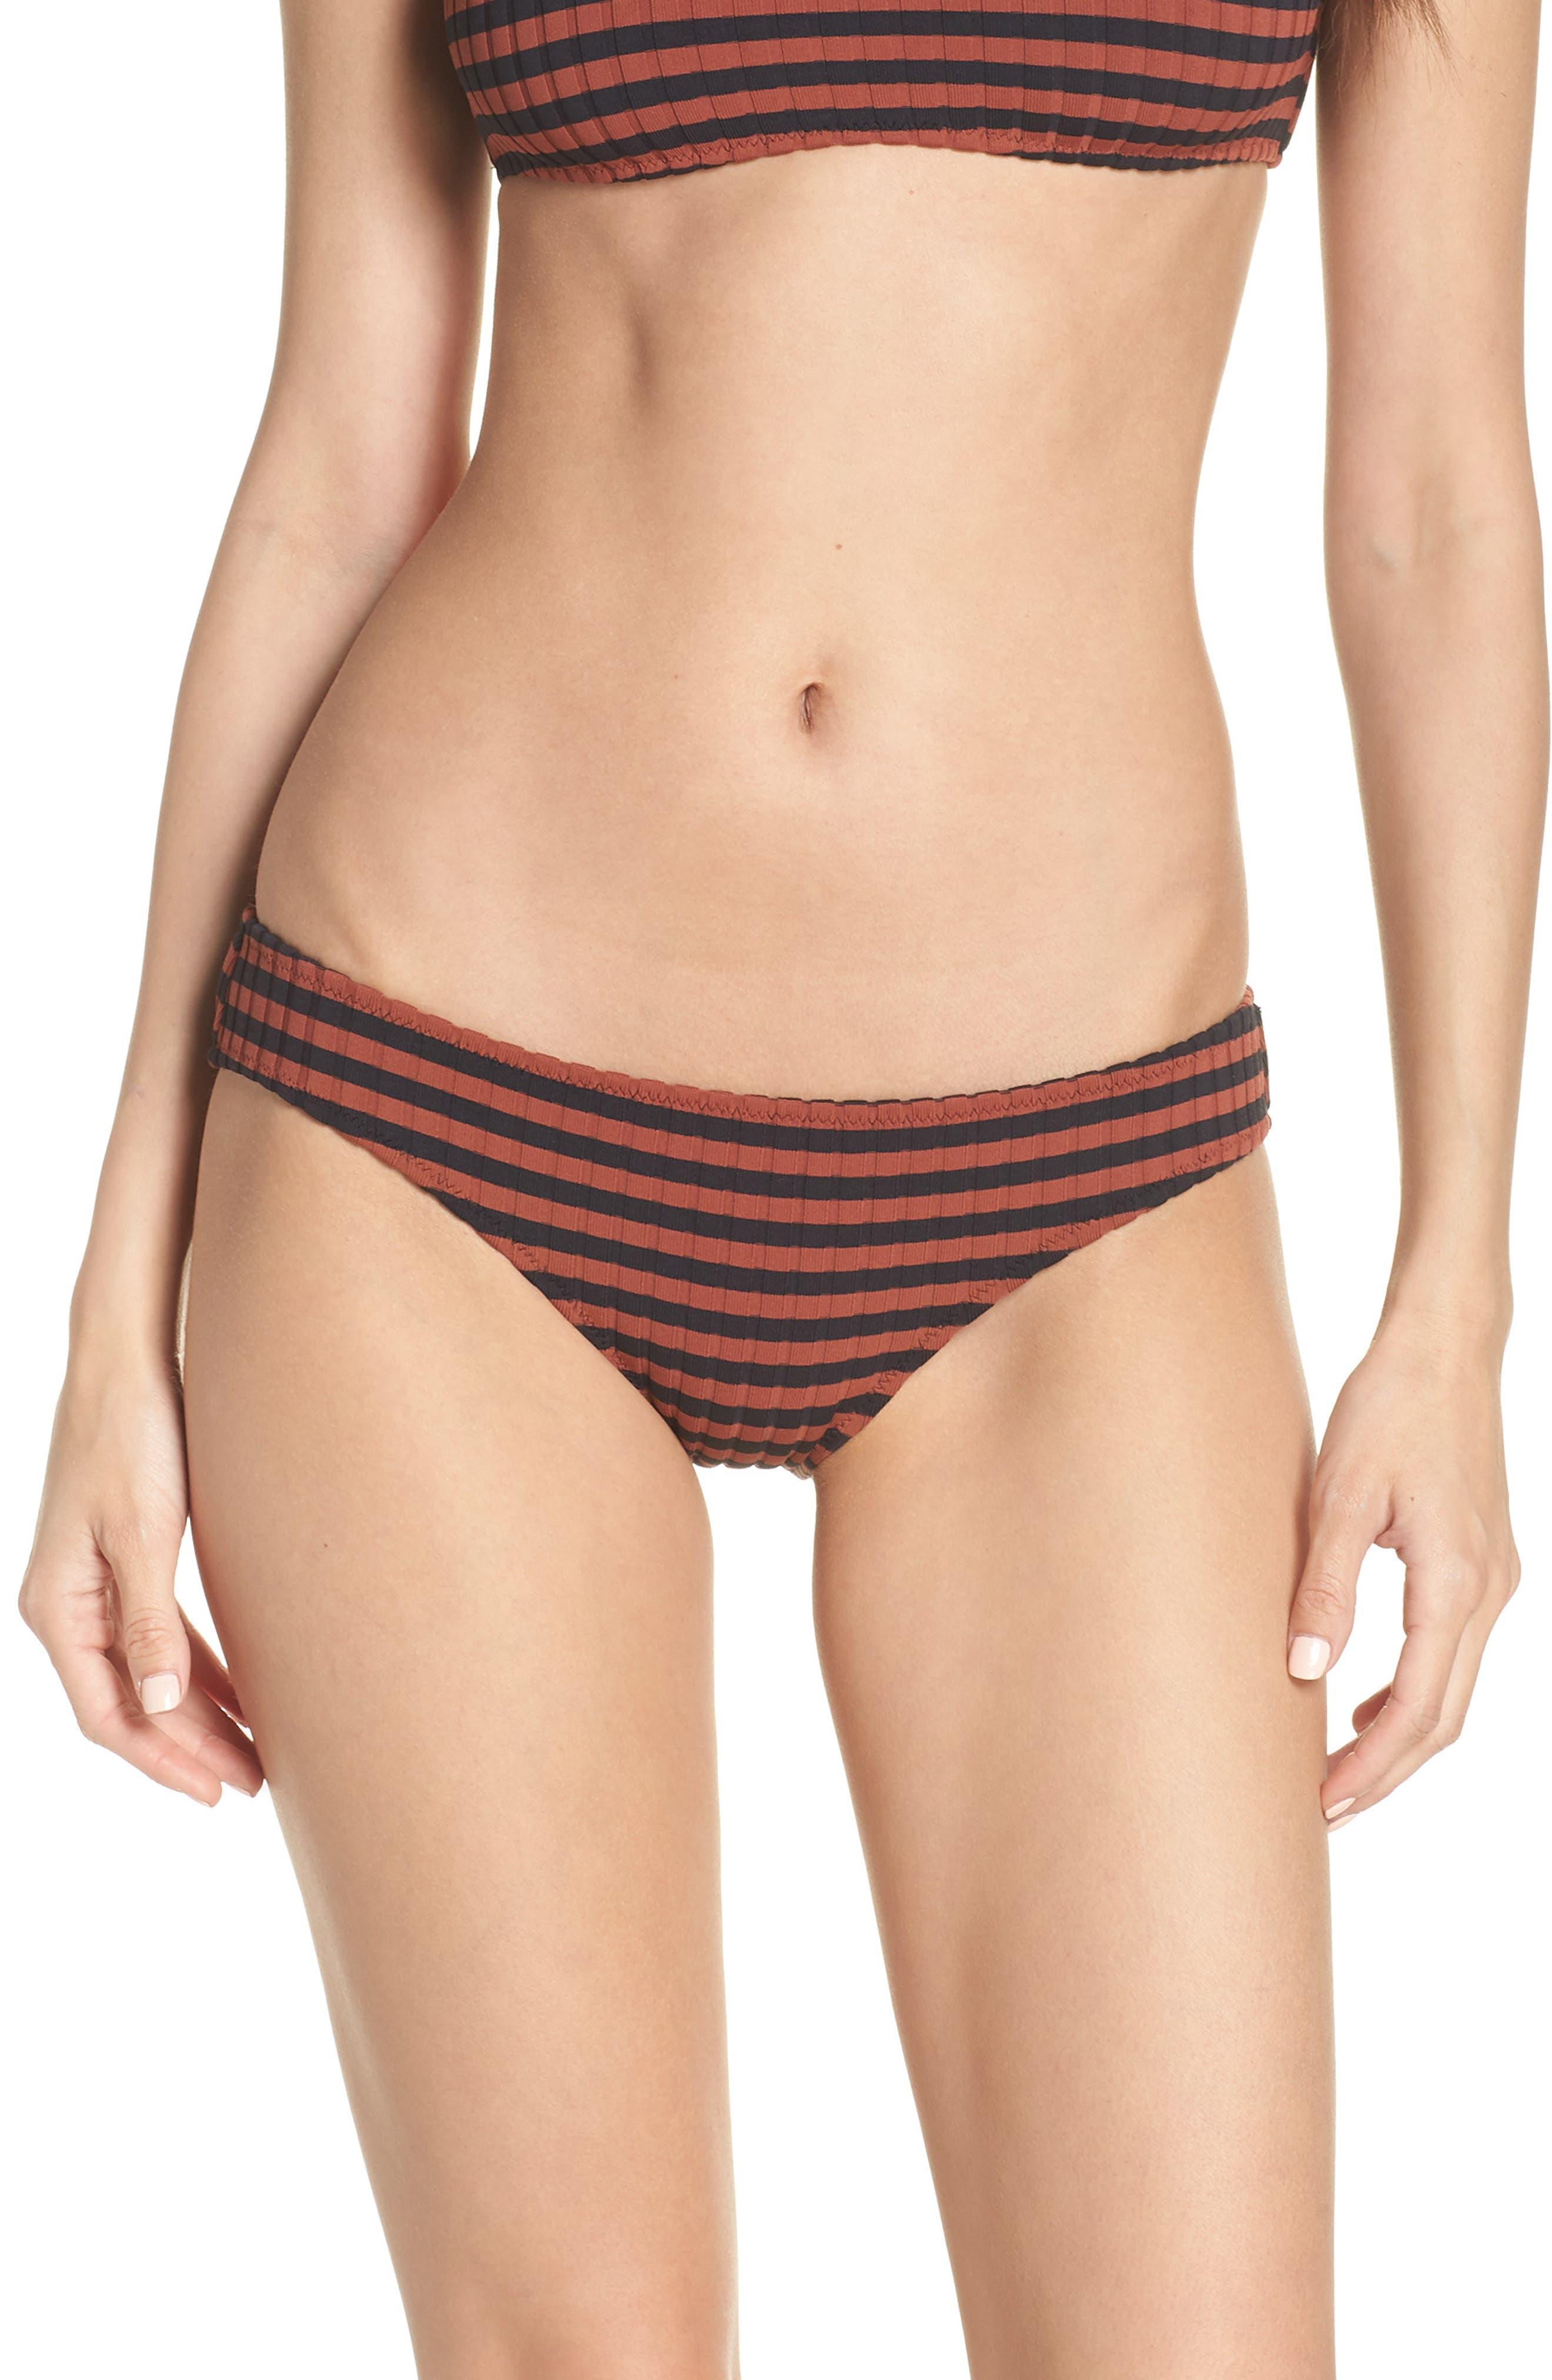 Solid & Striped Elle Bikini Bottoms, Brown